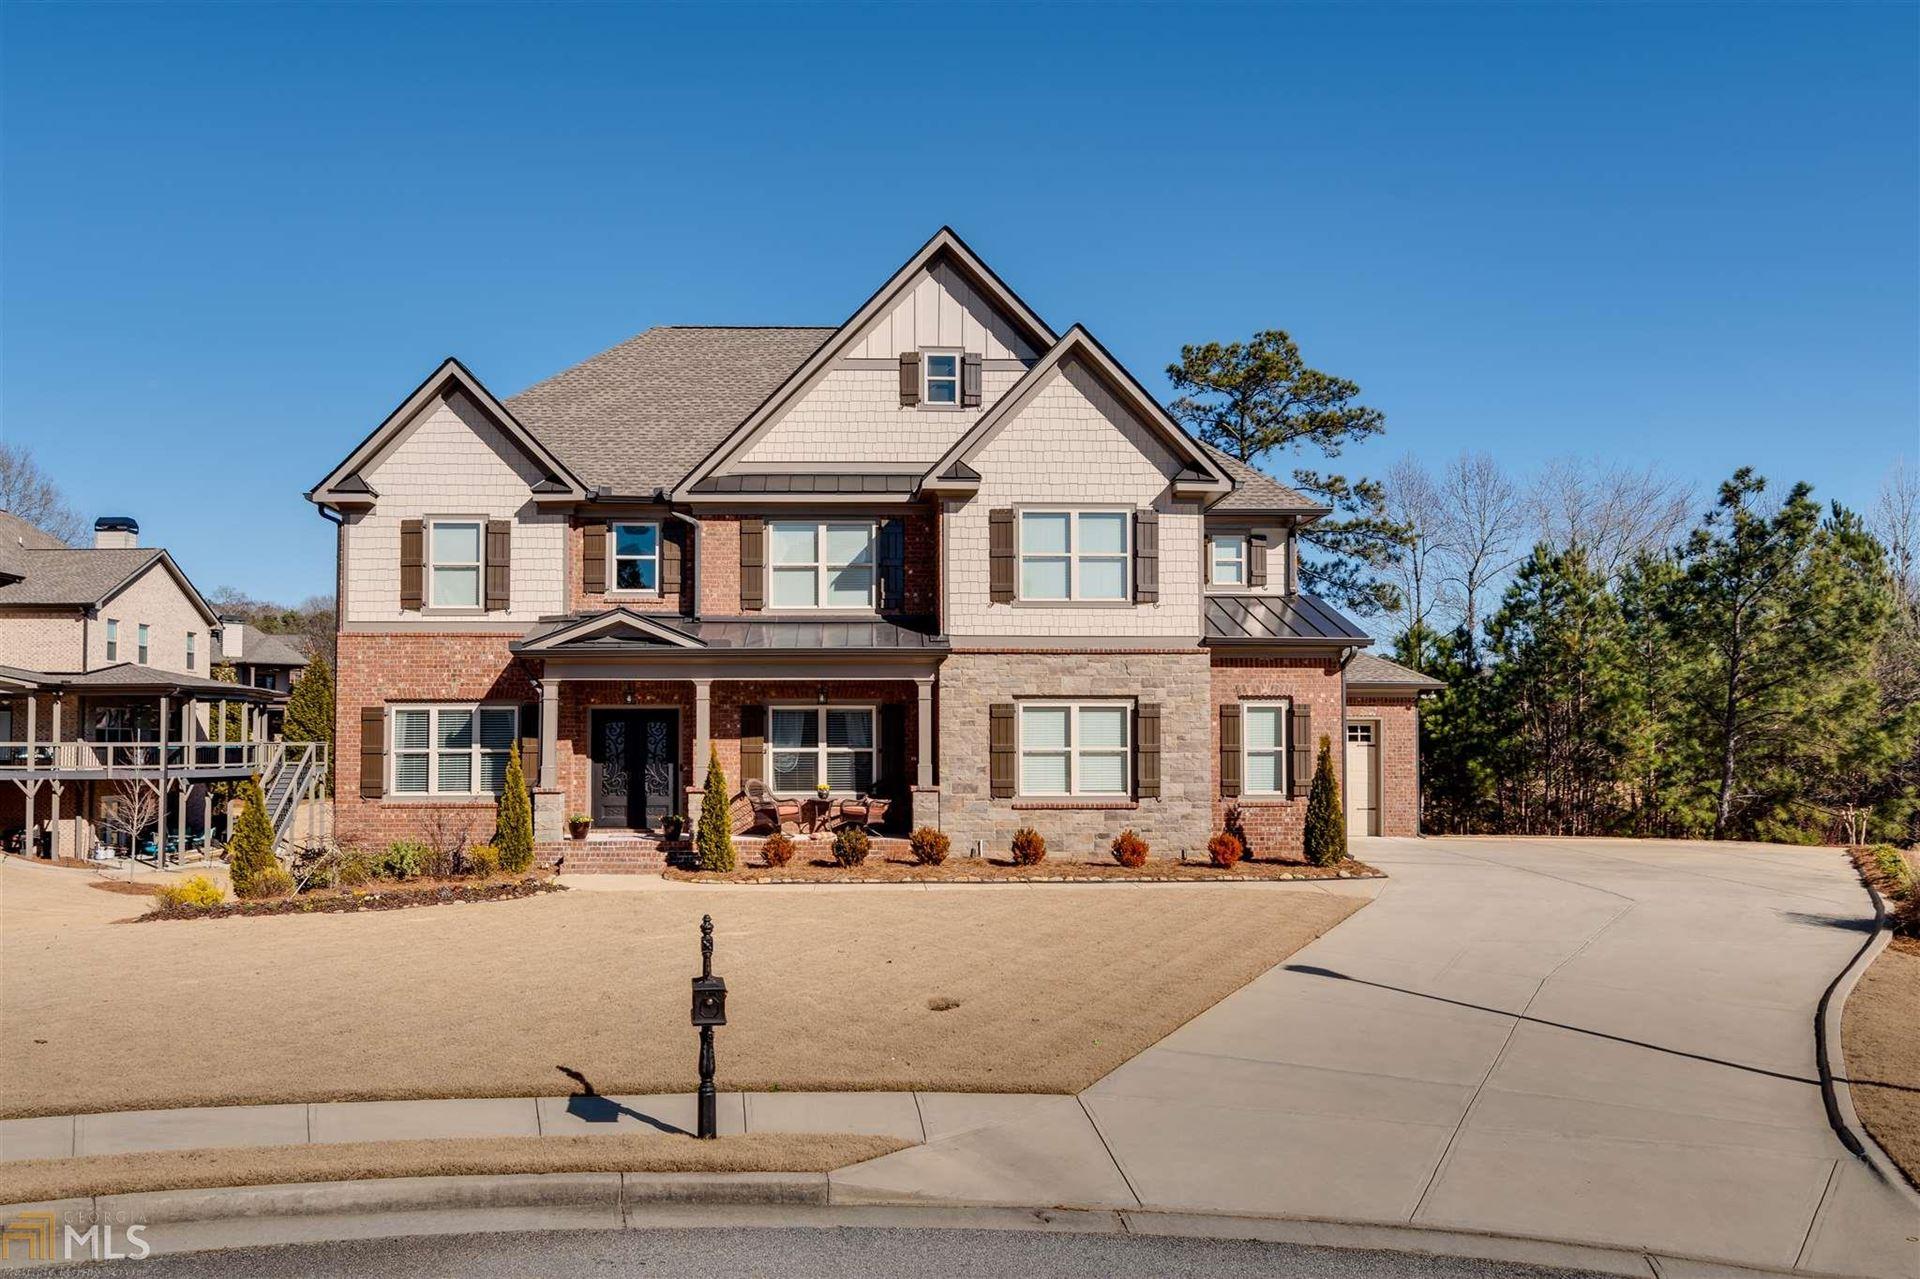 2582 Heritage Lake Cv, Grayson, GA 30017 - MLS#: 8915142